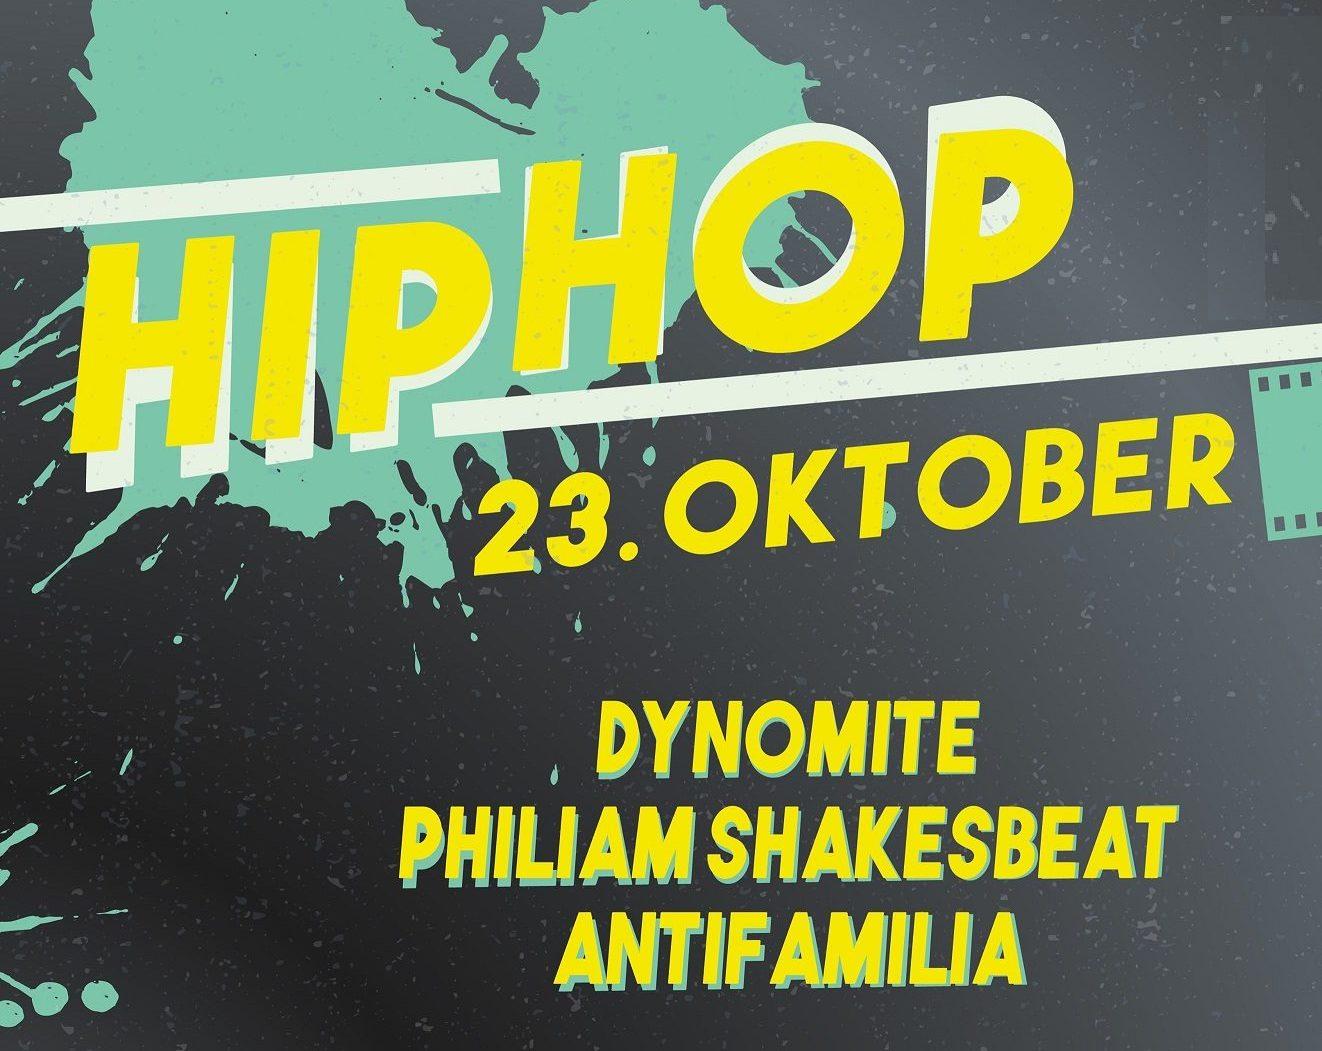 hip hop im fuemreif_dynomite_shakesbear_attergau